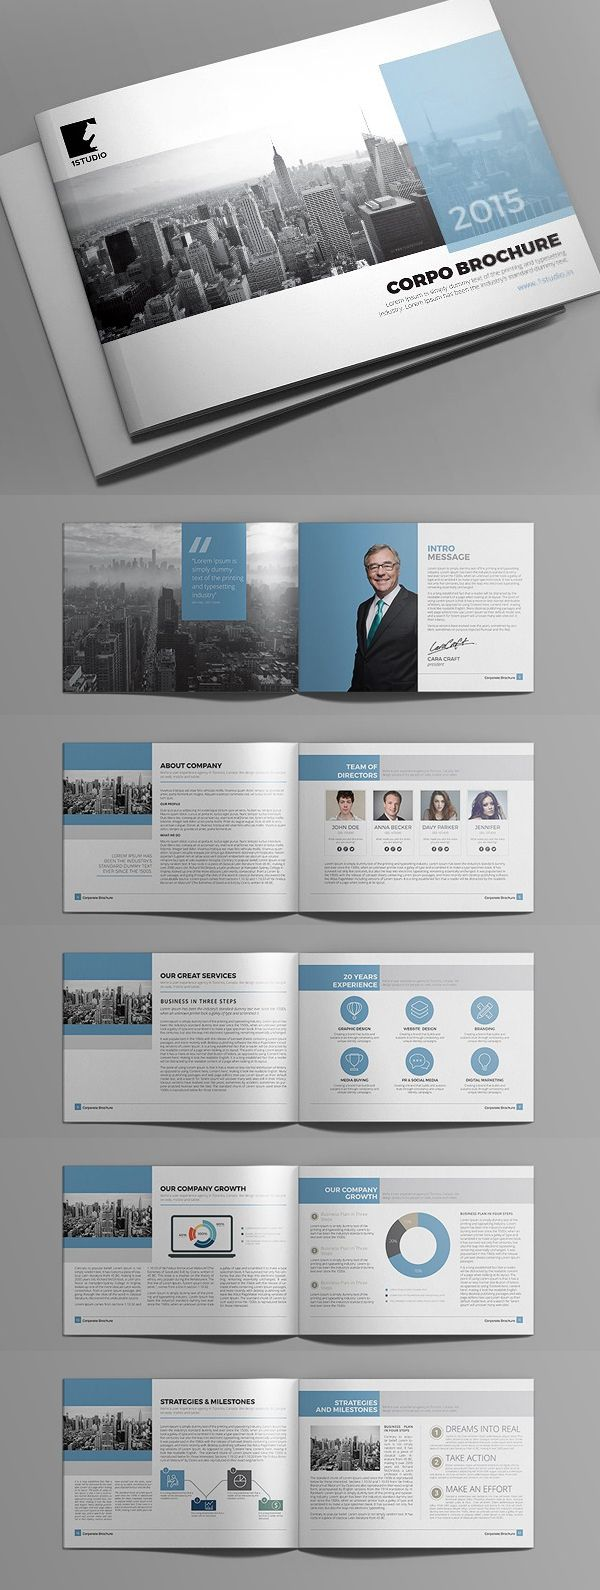 Landscape Brochure / Annual Report 2017 Template